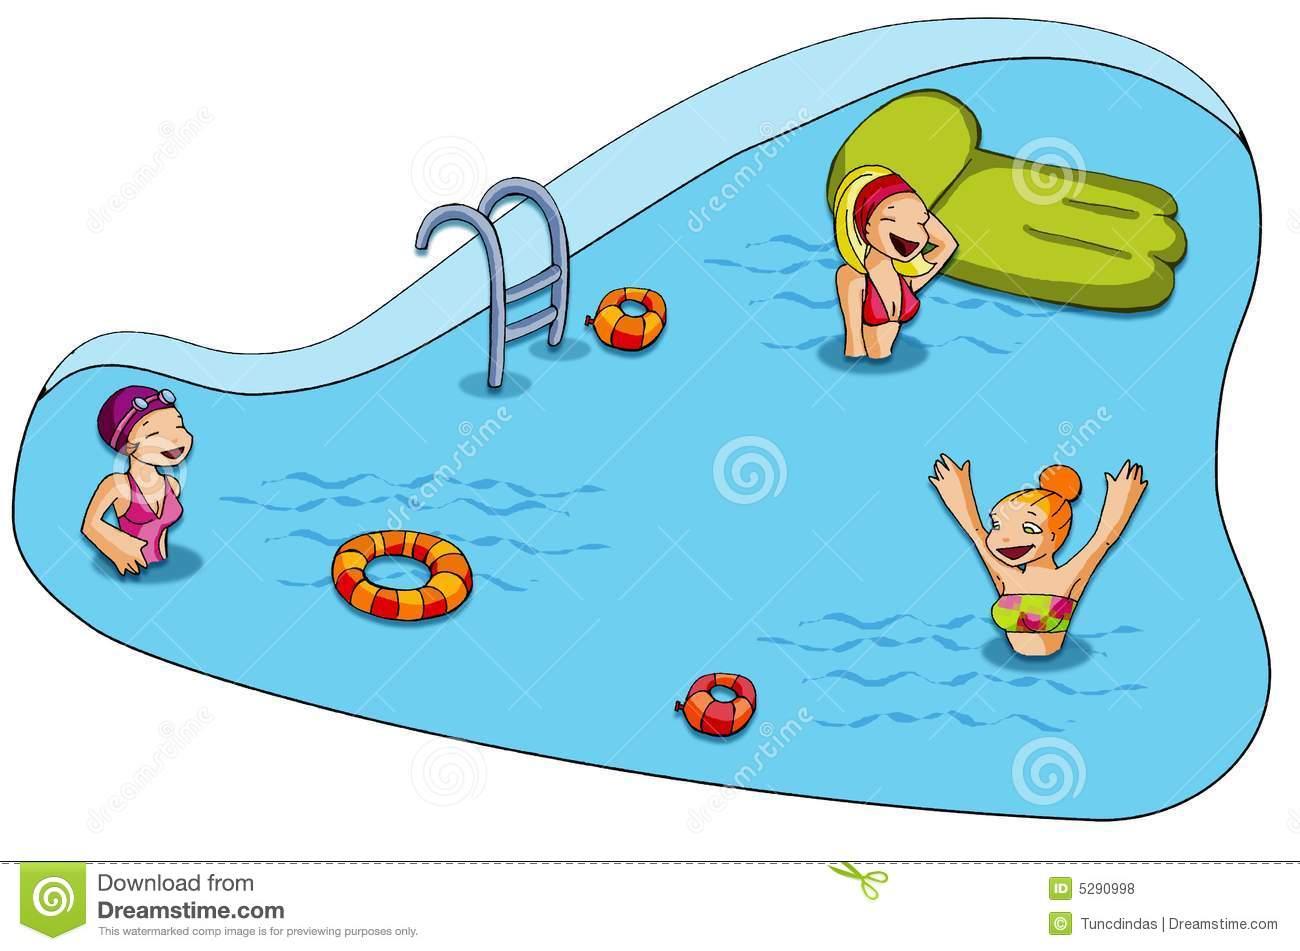 Swimming Pool Royalty Free Stock Photos -Swimming Pool Royalty Free Stock Photos Image 5290998-2